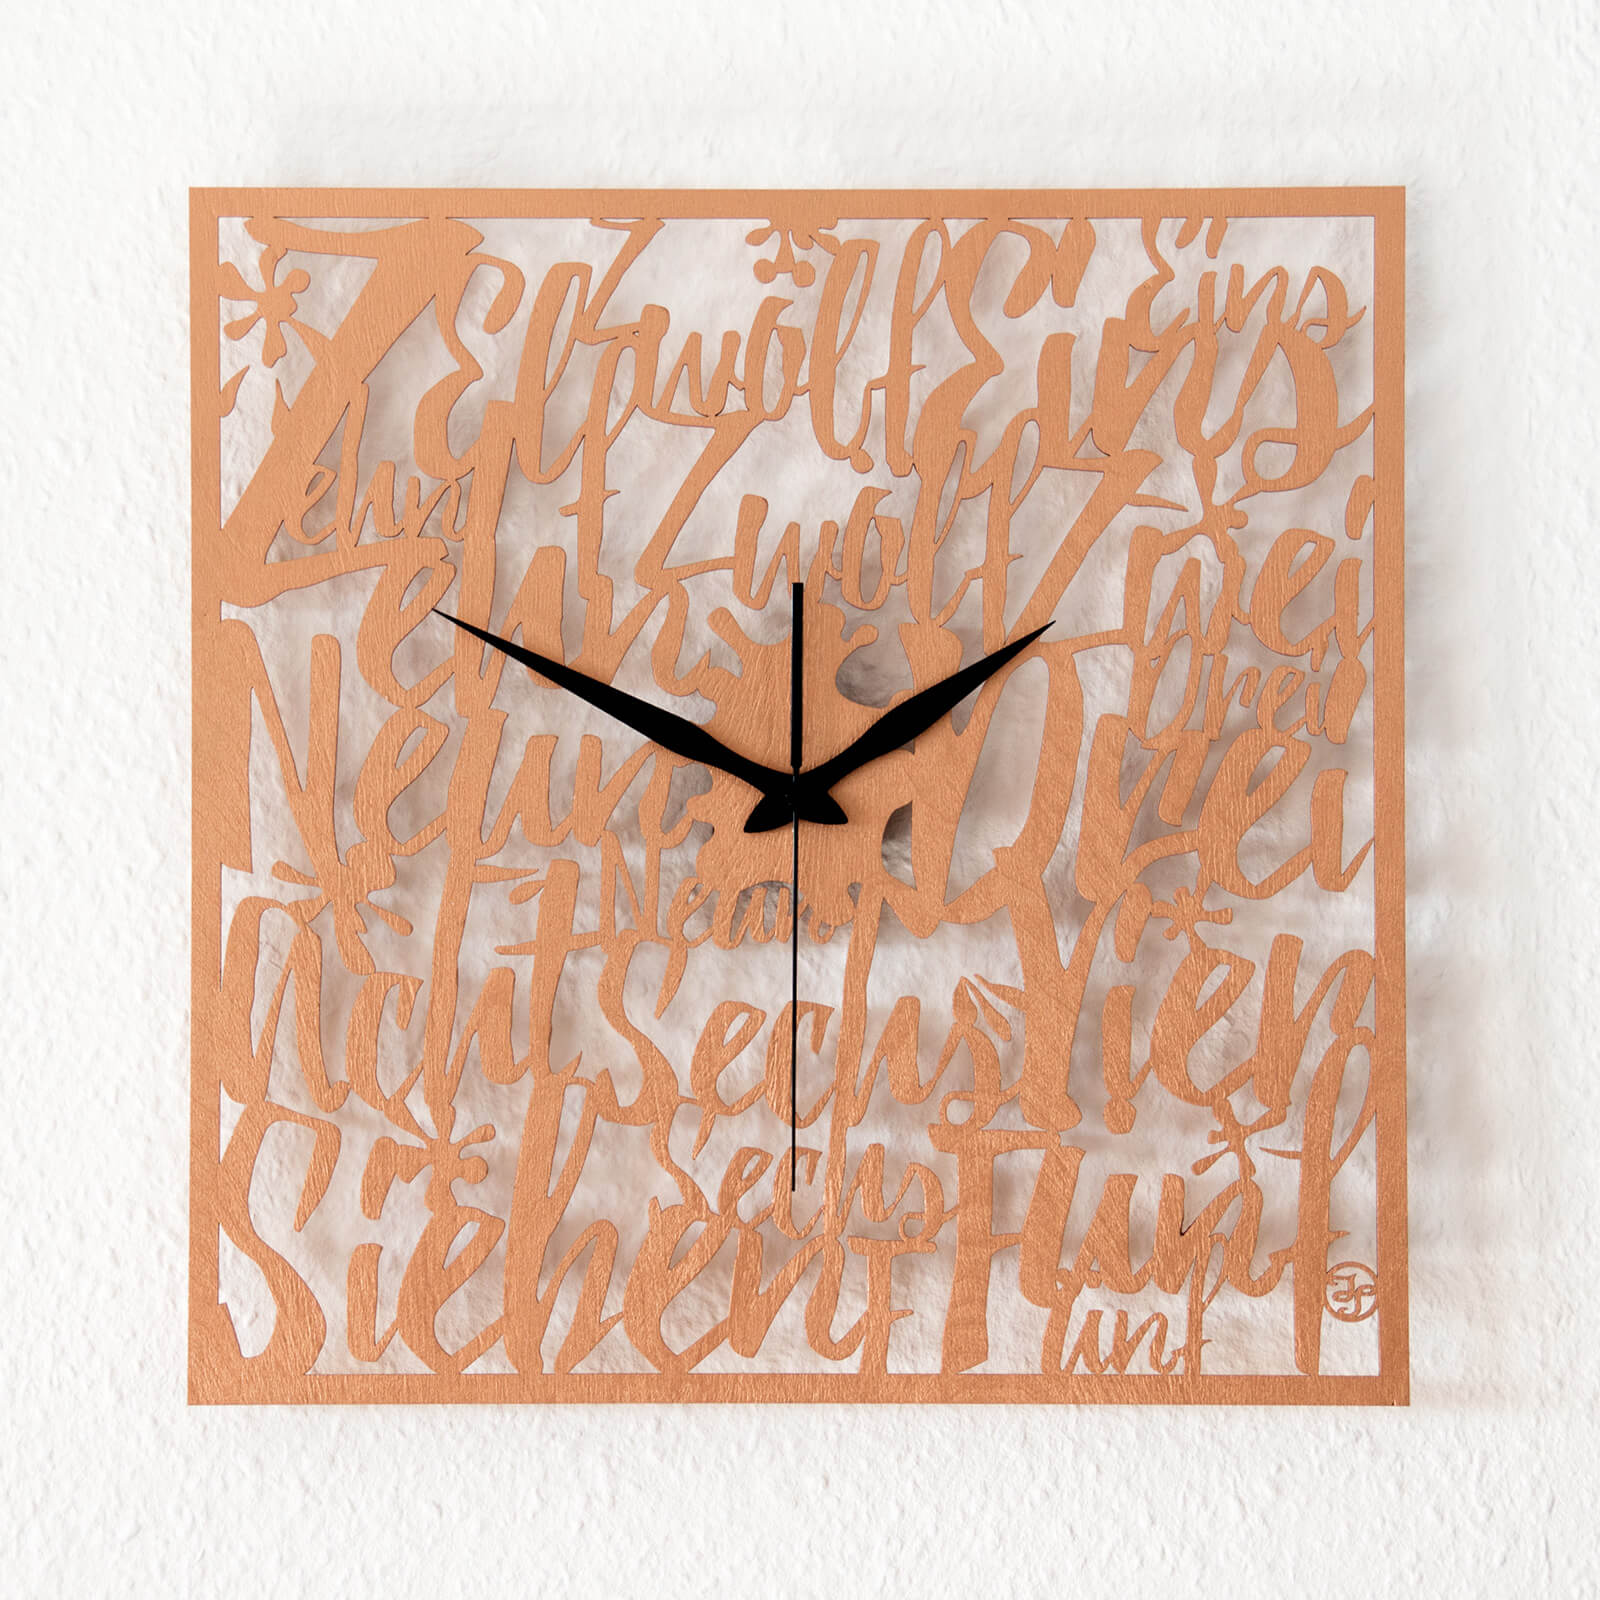 typografische wanduhr memories wanduhren design atelier. Black Bedroom Furniture Sets. Home Design Ideas